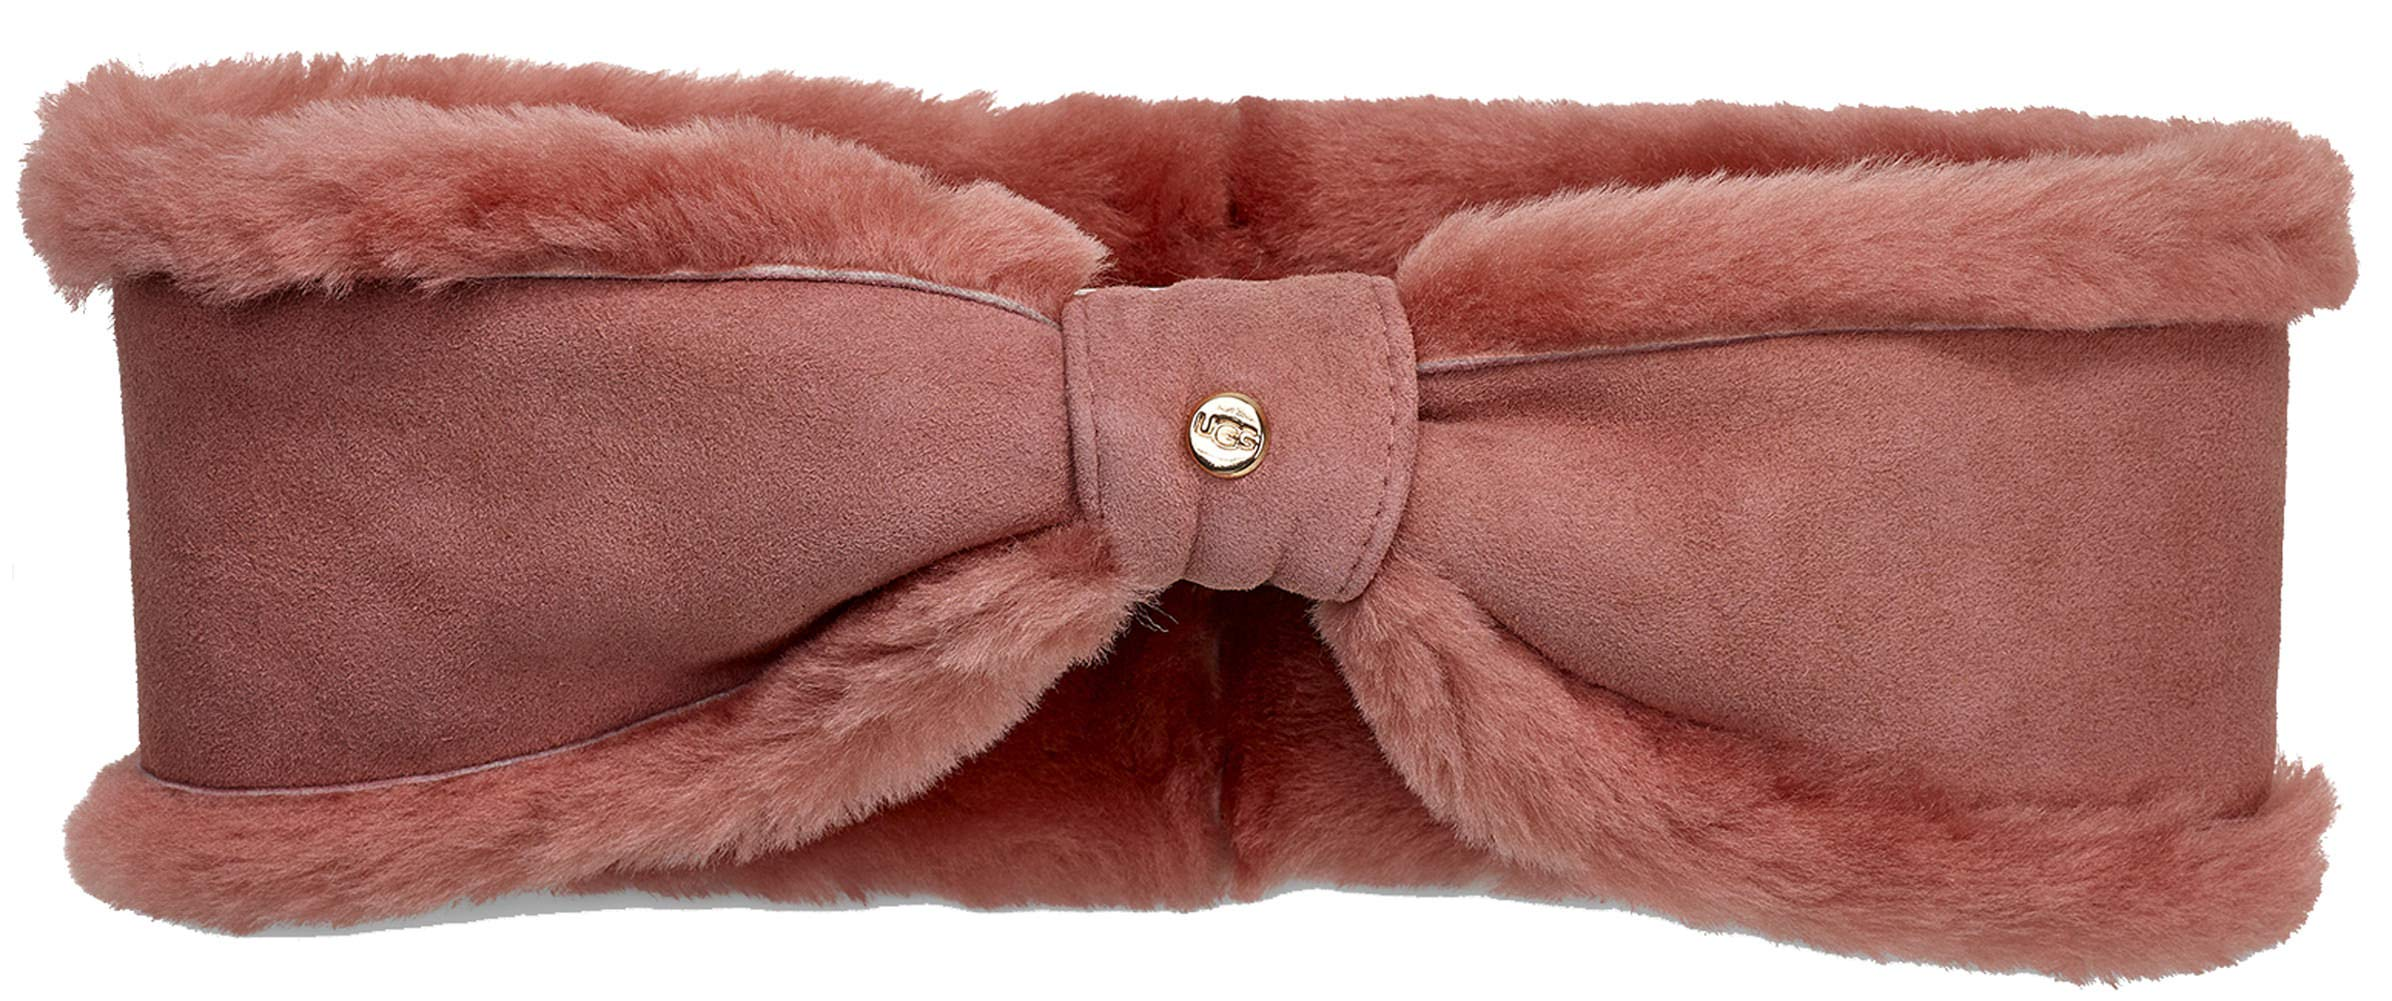 UGG Women's Bow Water Resistant Sheepskin Headband Lantana Pink One Size